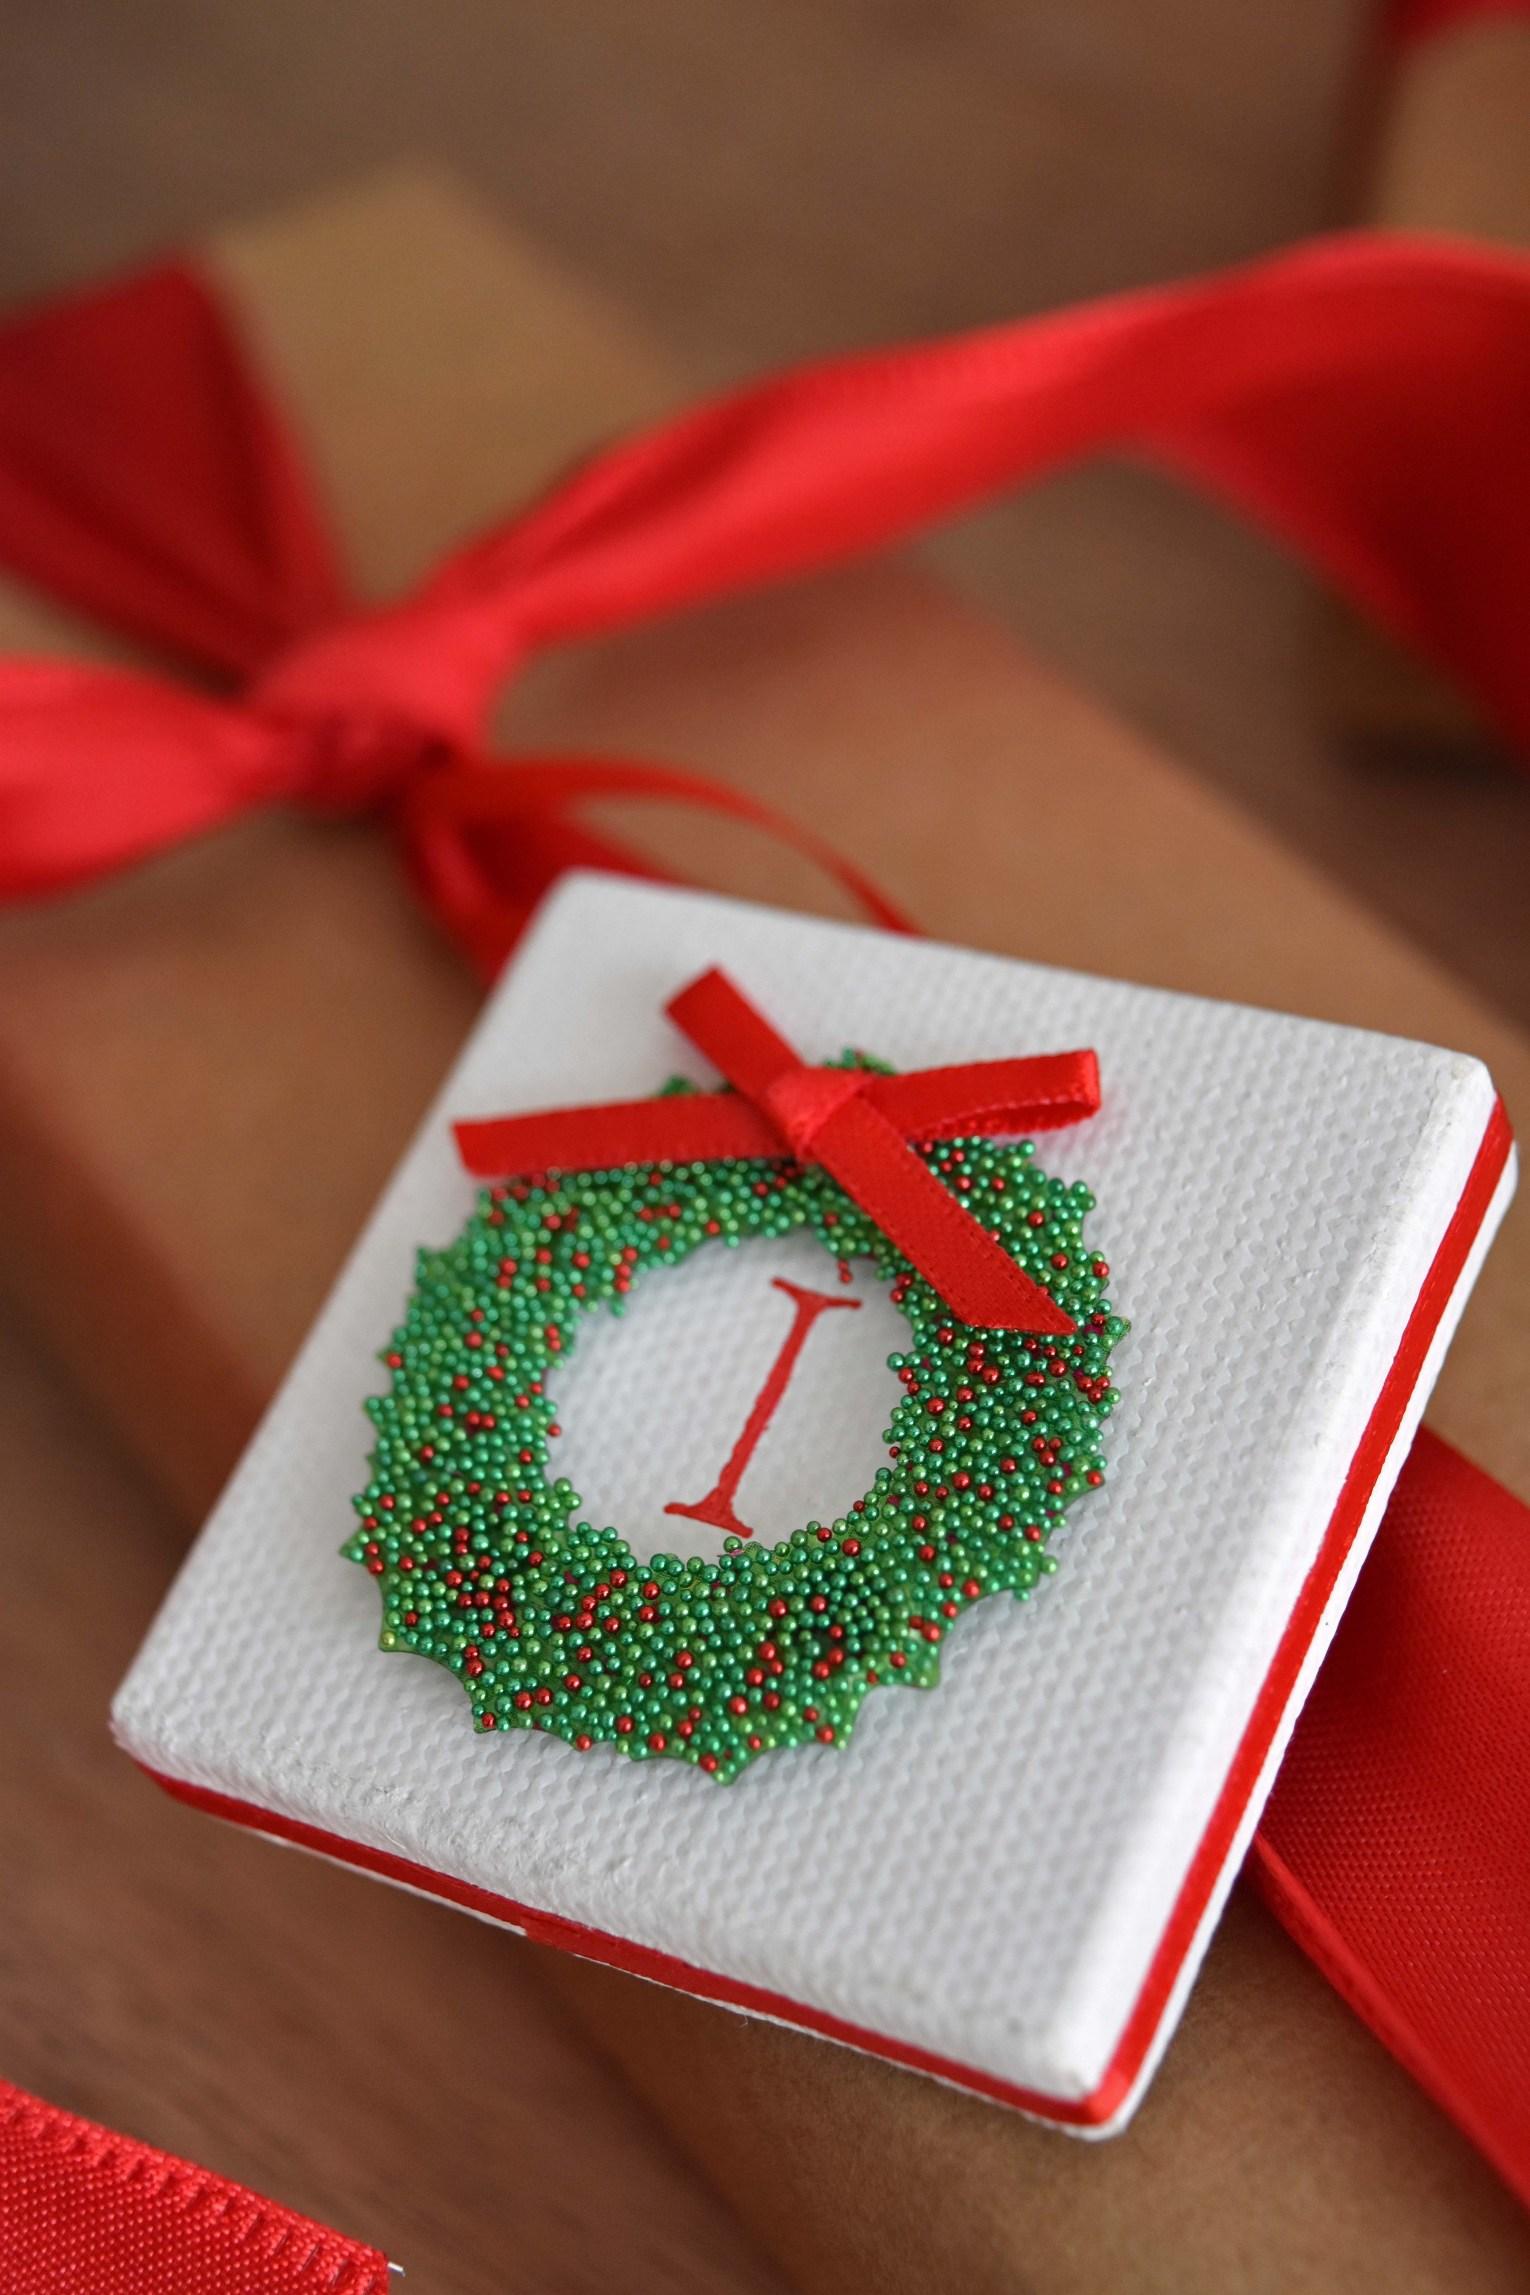 Christmas Gift Tags To Make.Mini Canvas Christmas Gift Tags So Cute Easy To Make